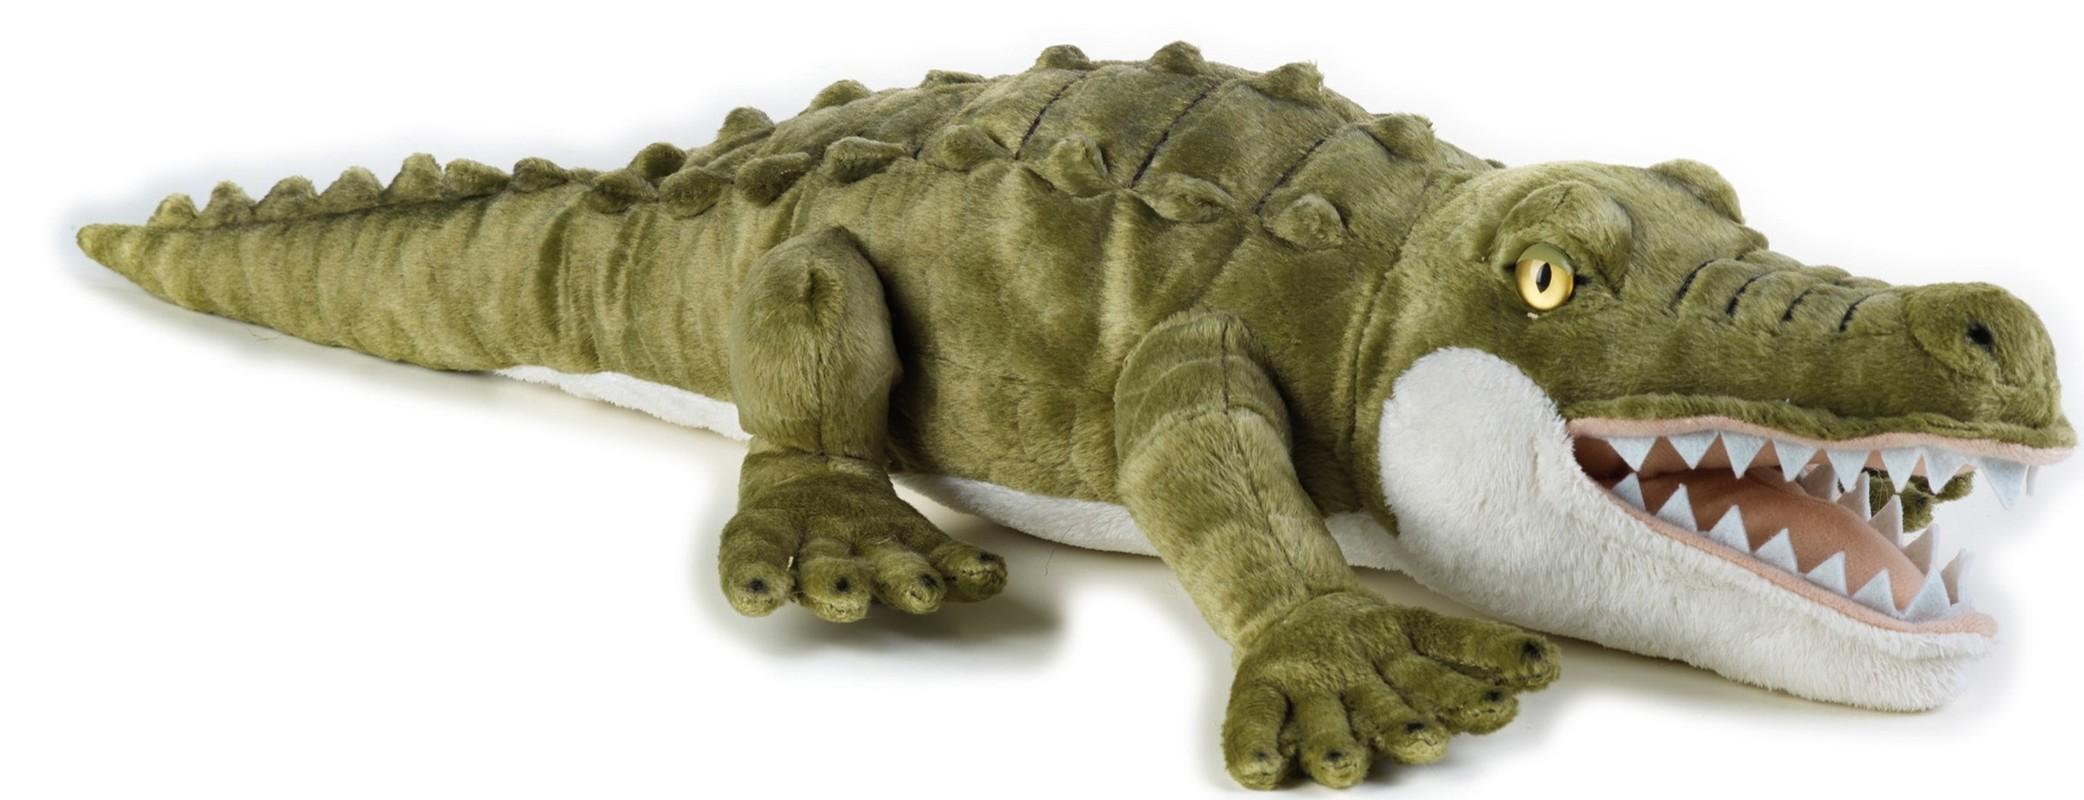 LELLY - National Geografic Zvieratká zo savany 770719 Krokodíl - 50 cm